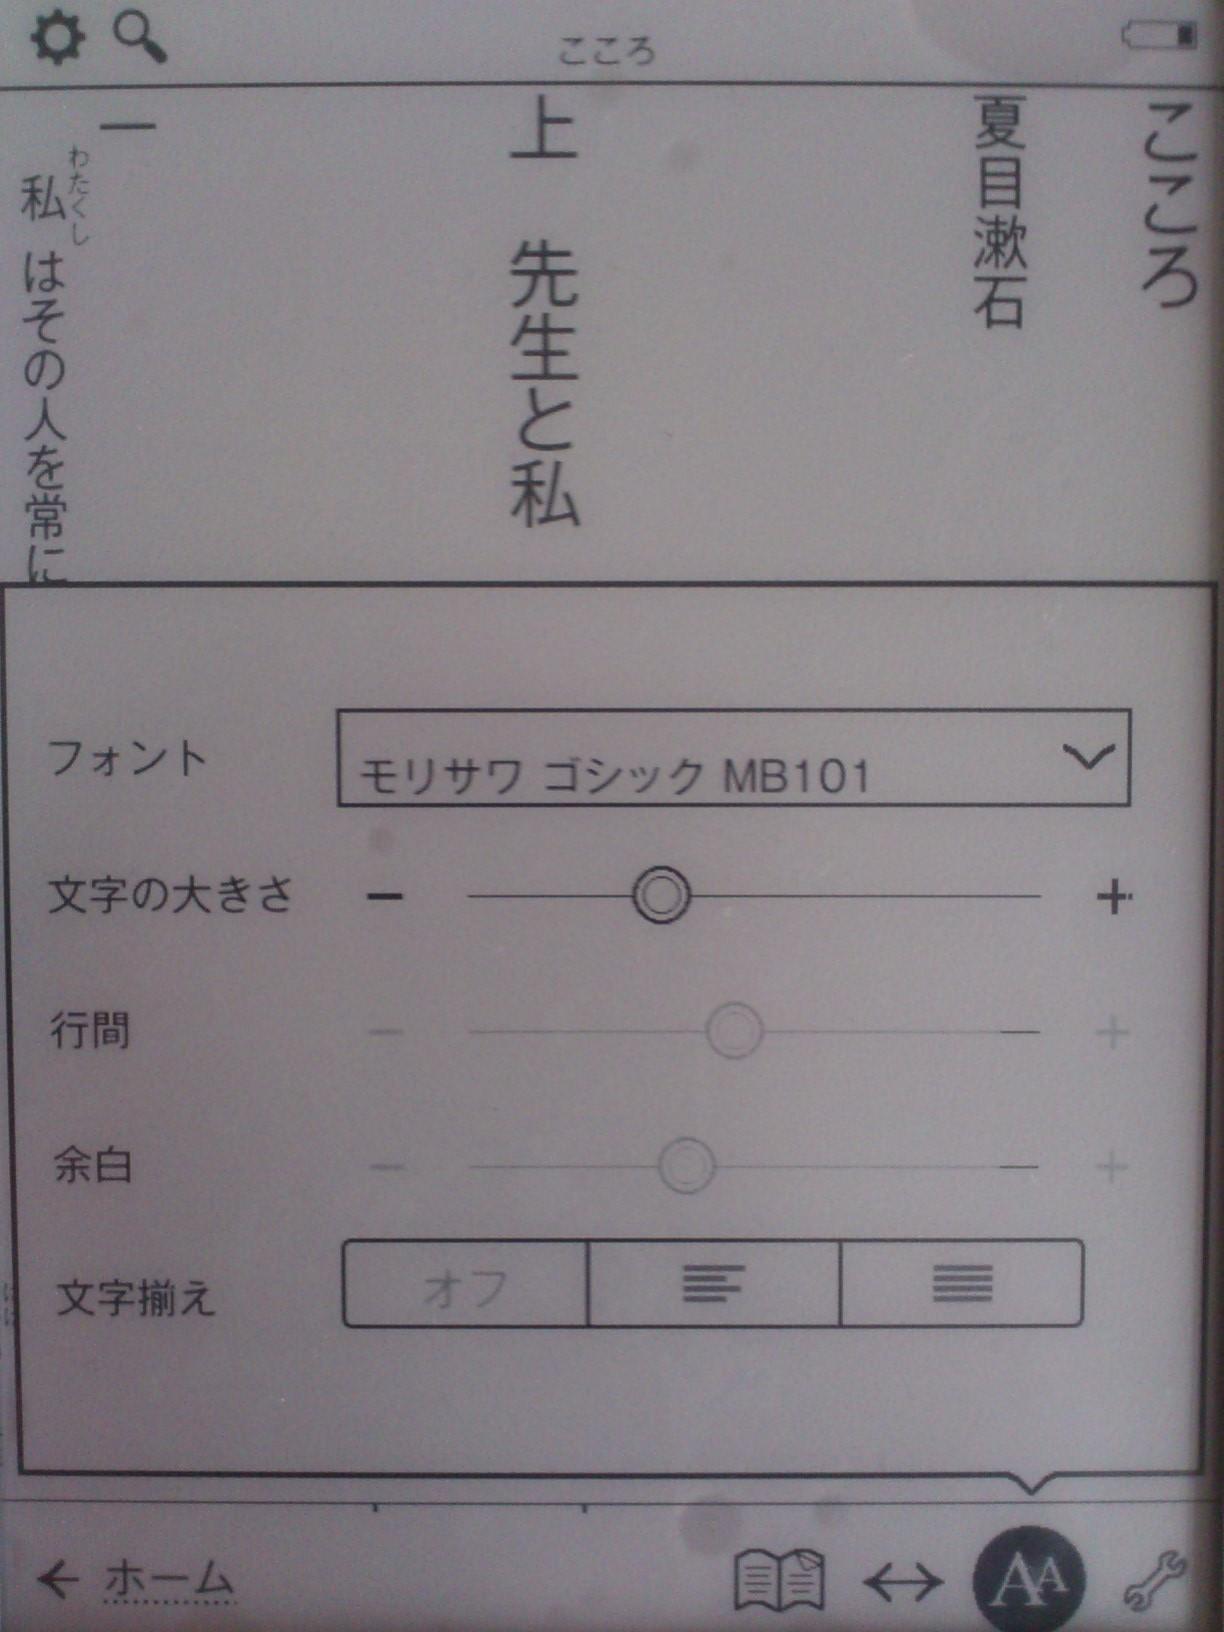 kob_touch_book7.jpg